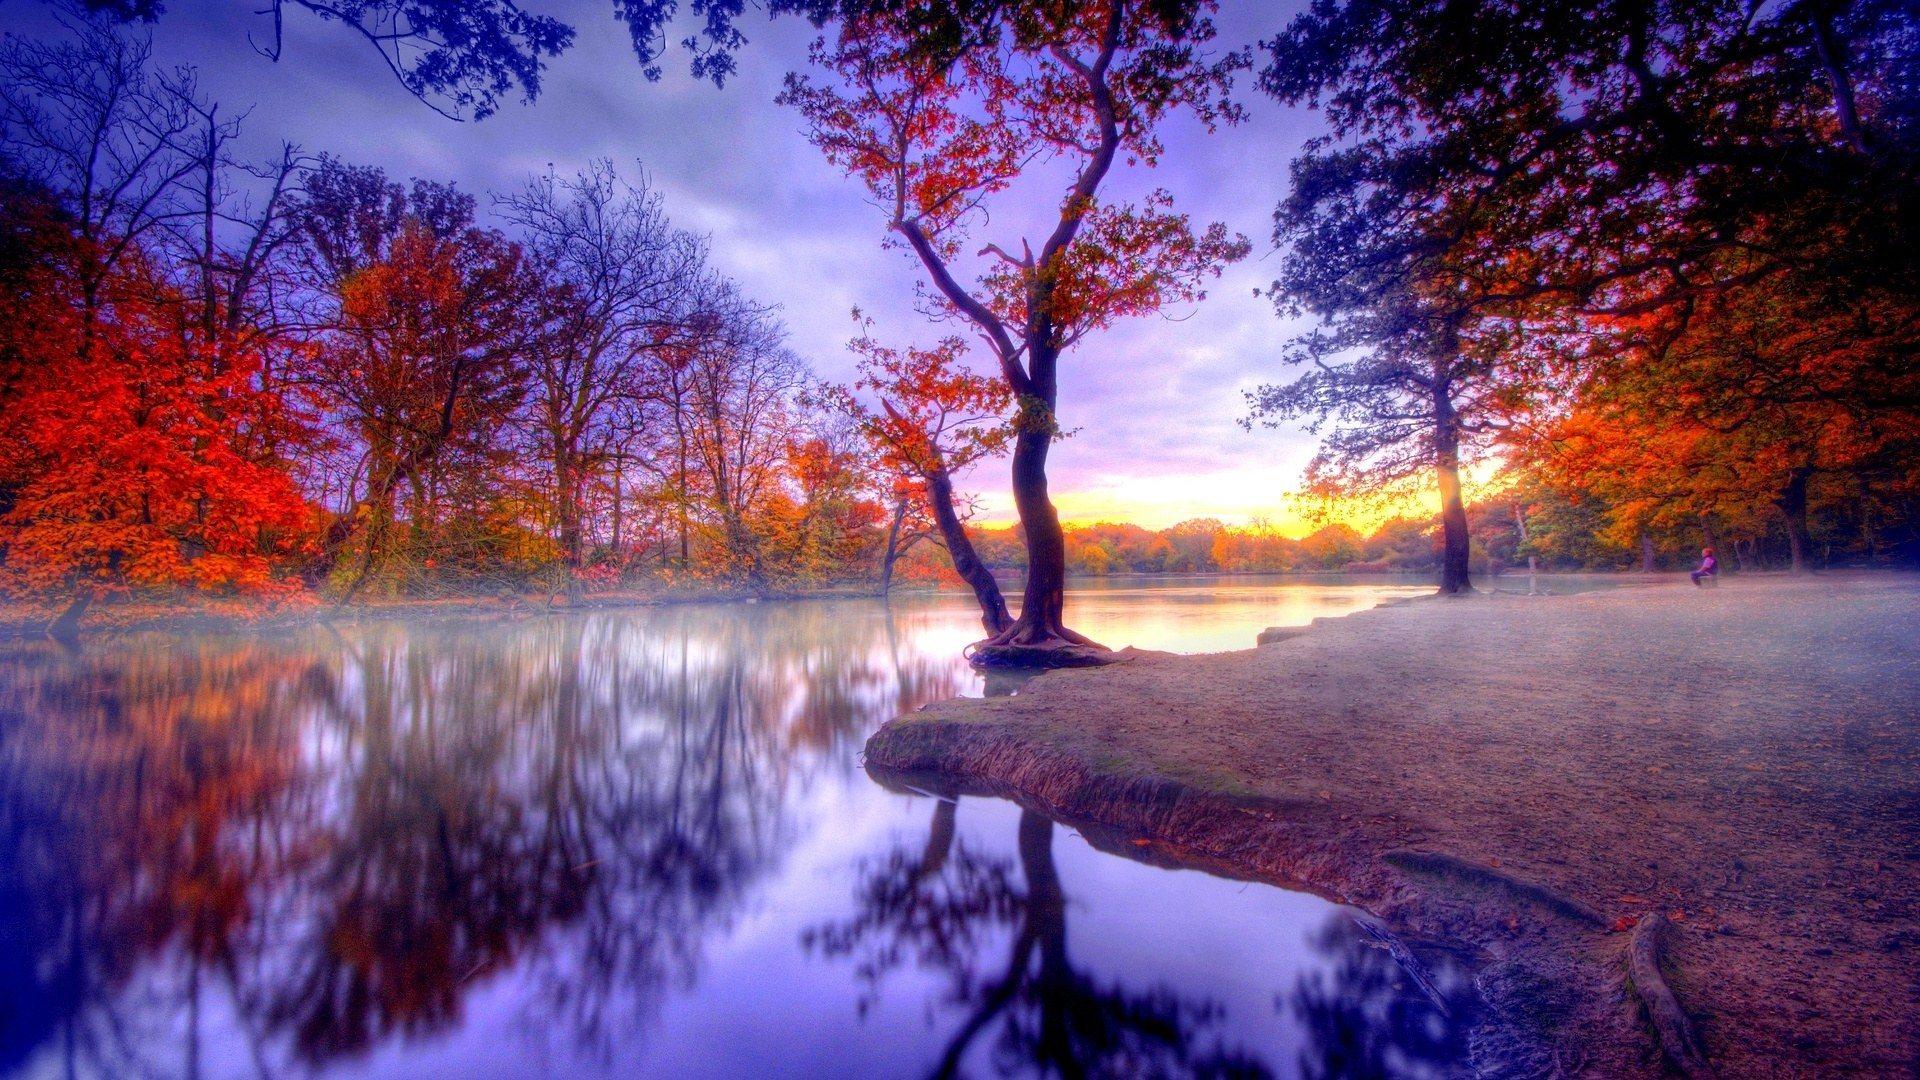 Autumn Landscape | Full HD Desktop Wallpapers 1080p